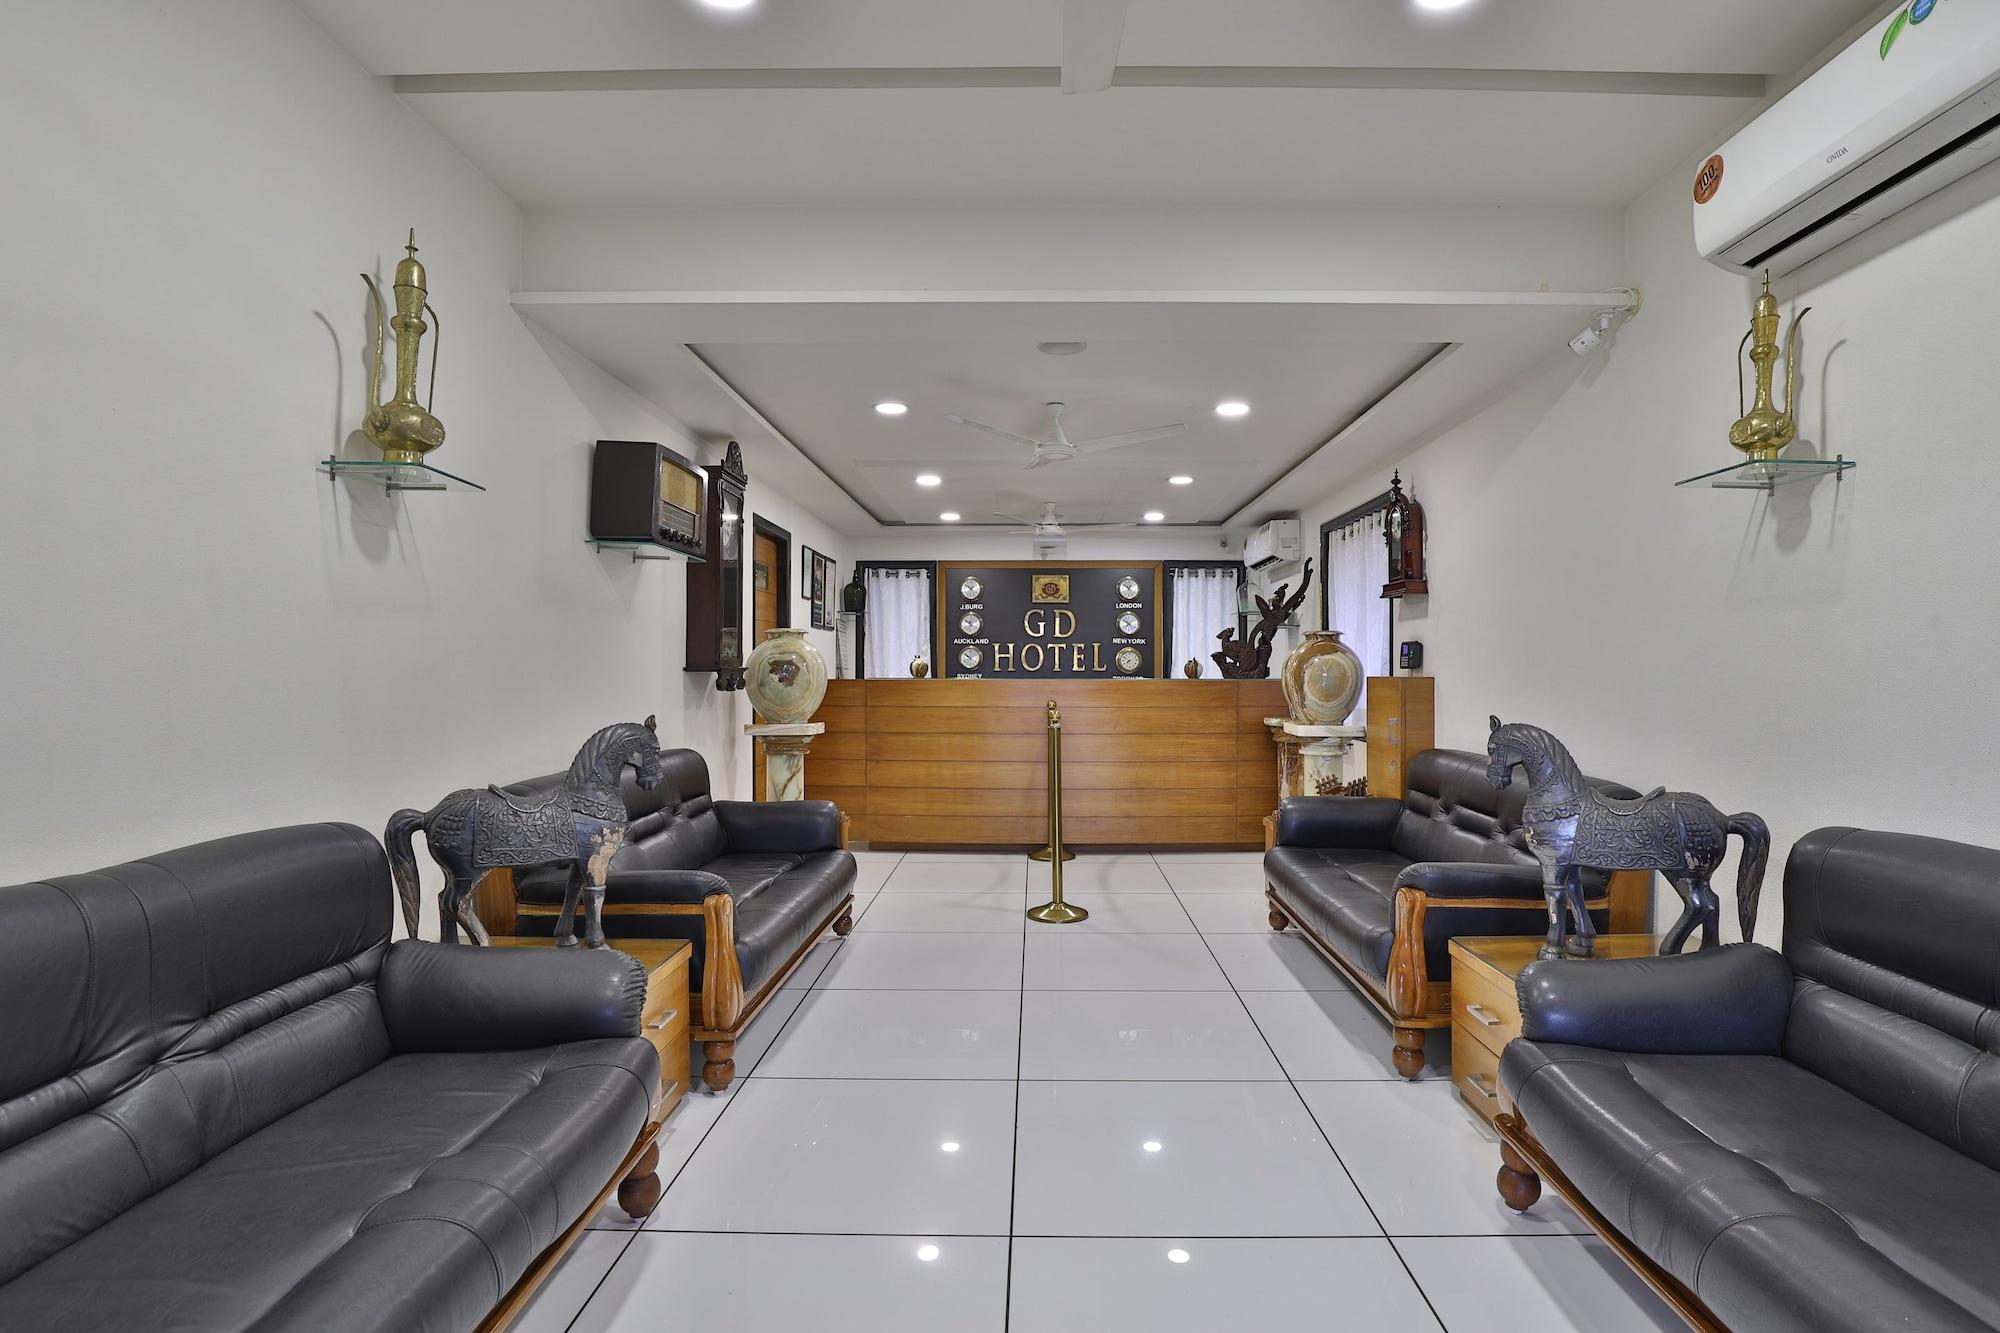 Palette - Gd Hotel, Navsari